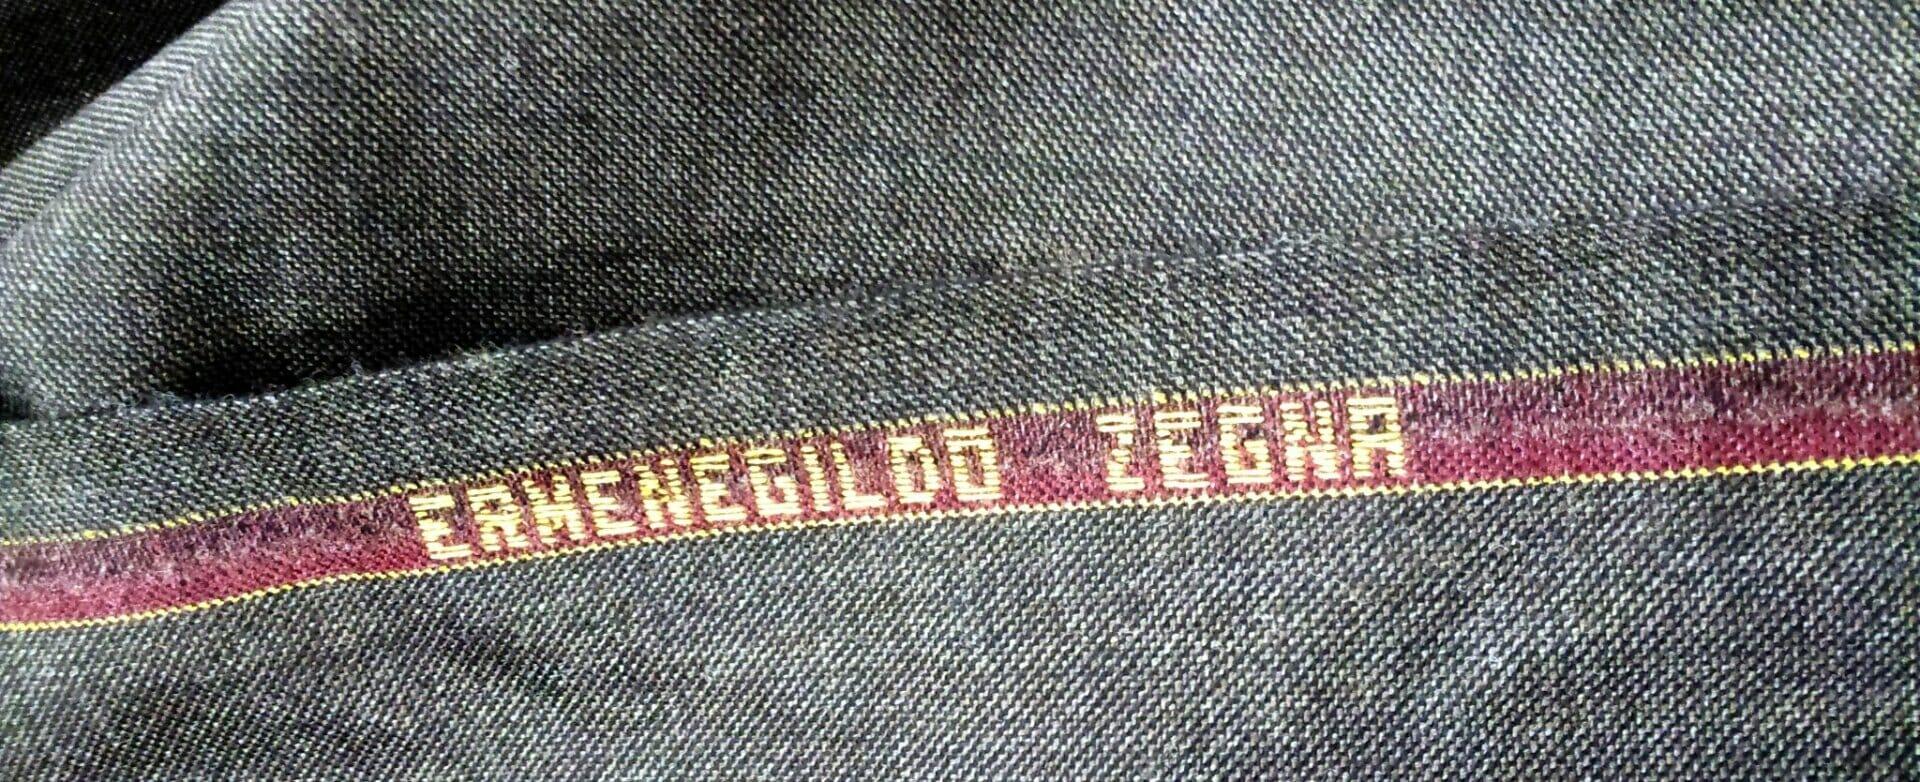 Electa 100% Superfine Australian Wool 330 gr. ~ Sartoria Scavelli ~ Roma